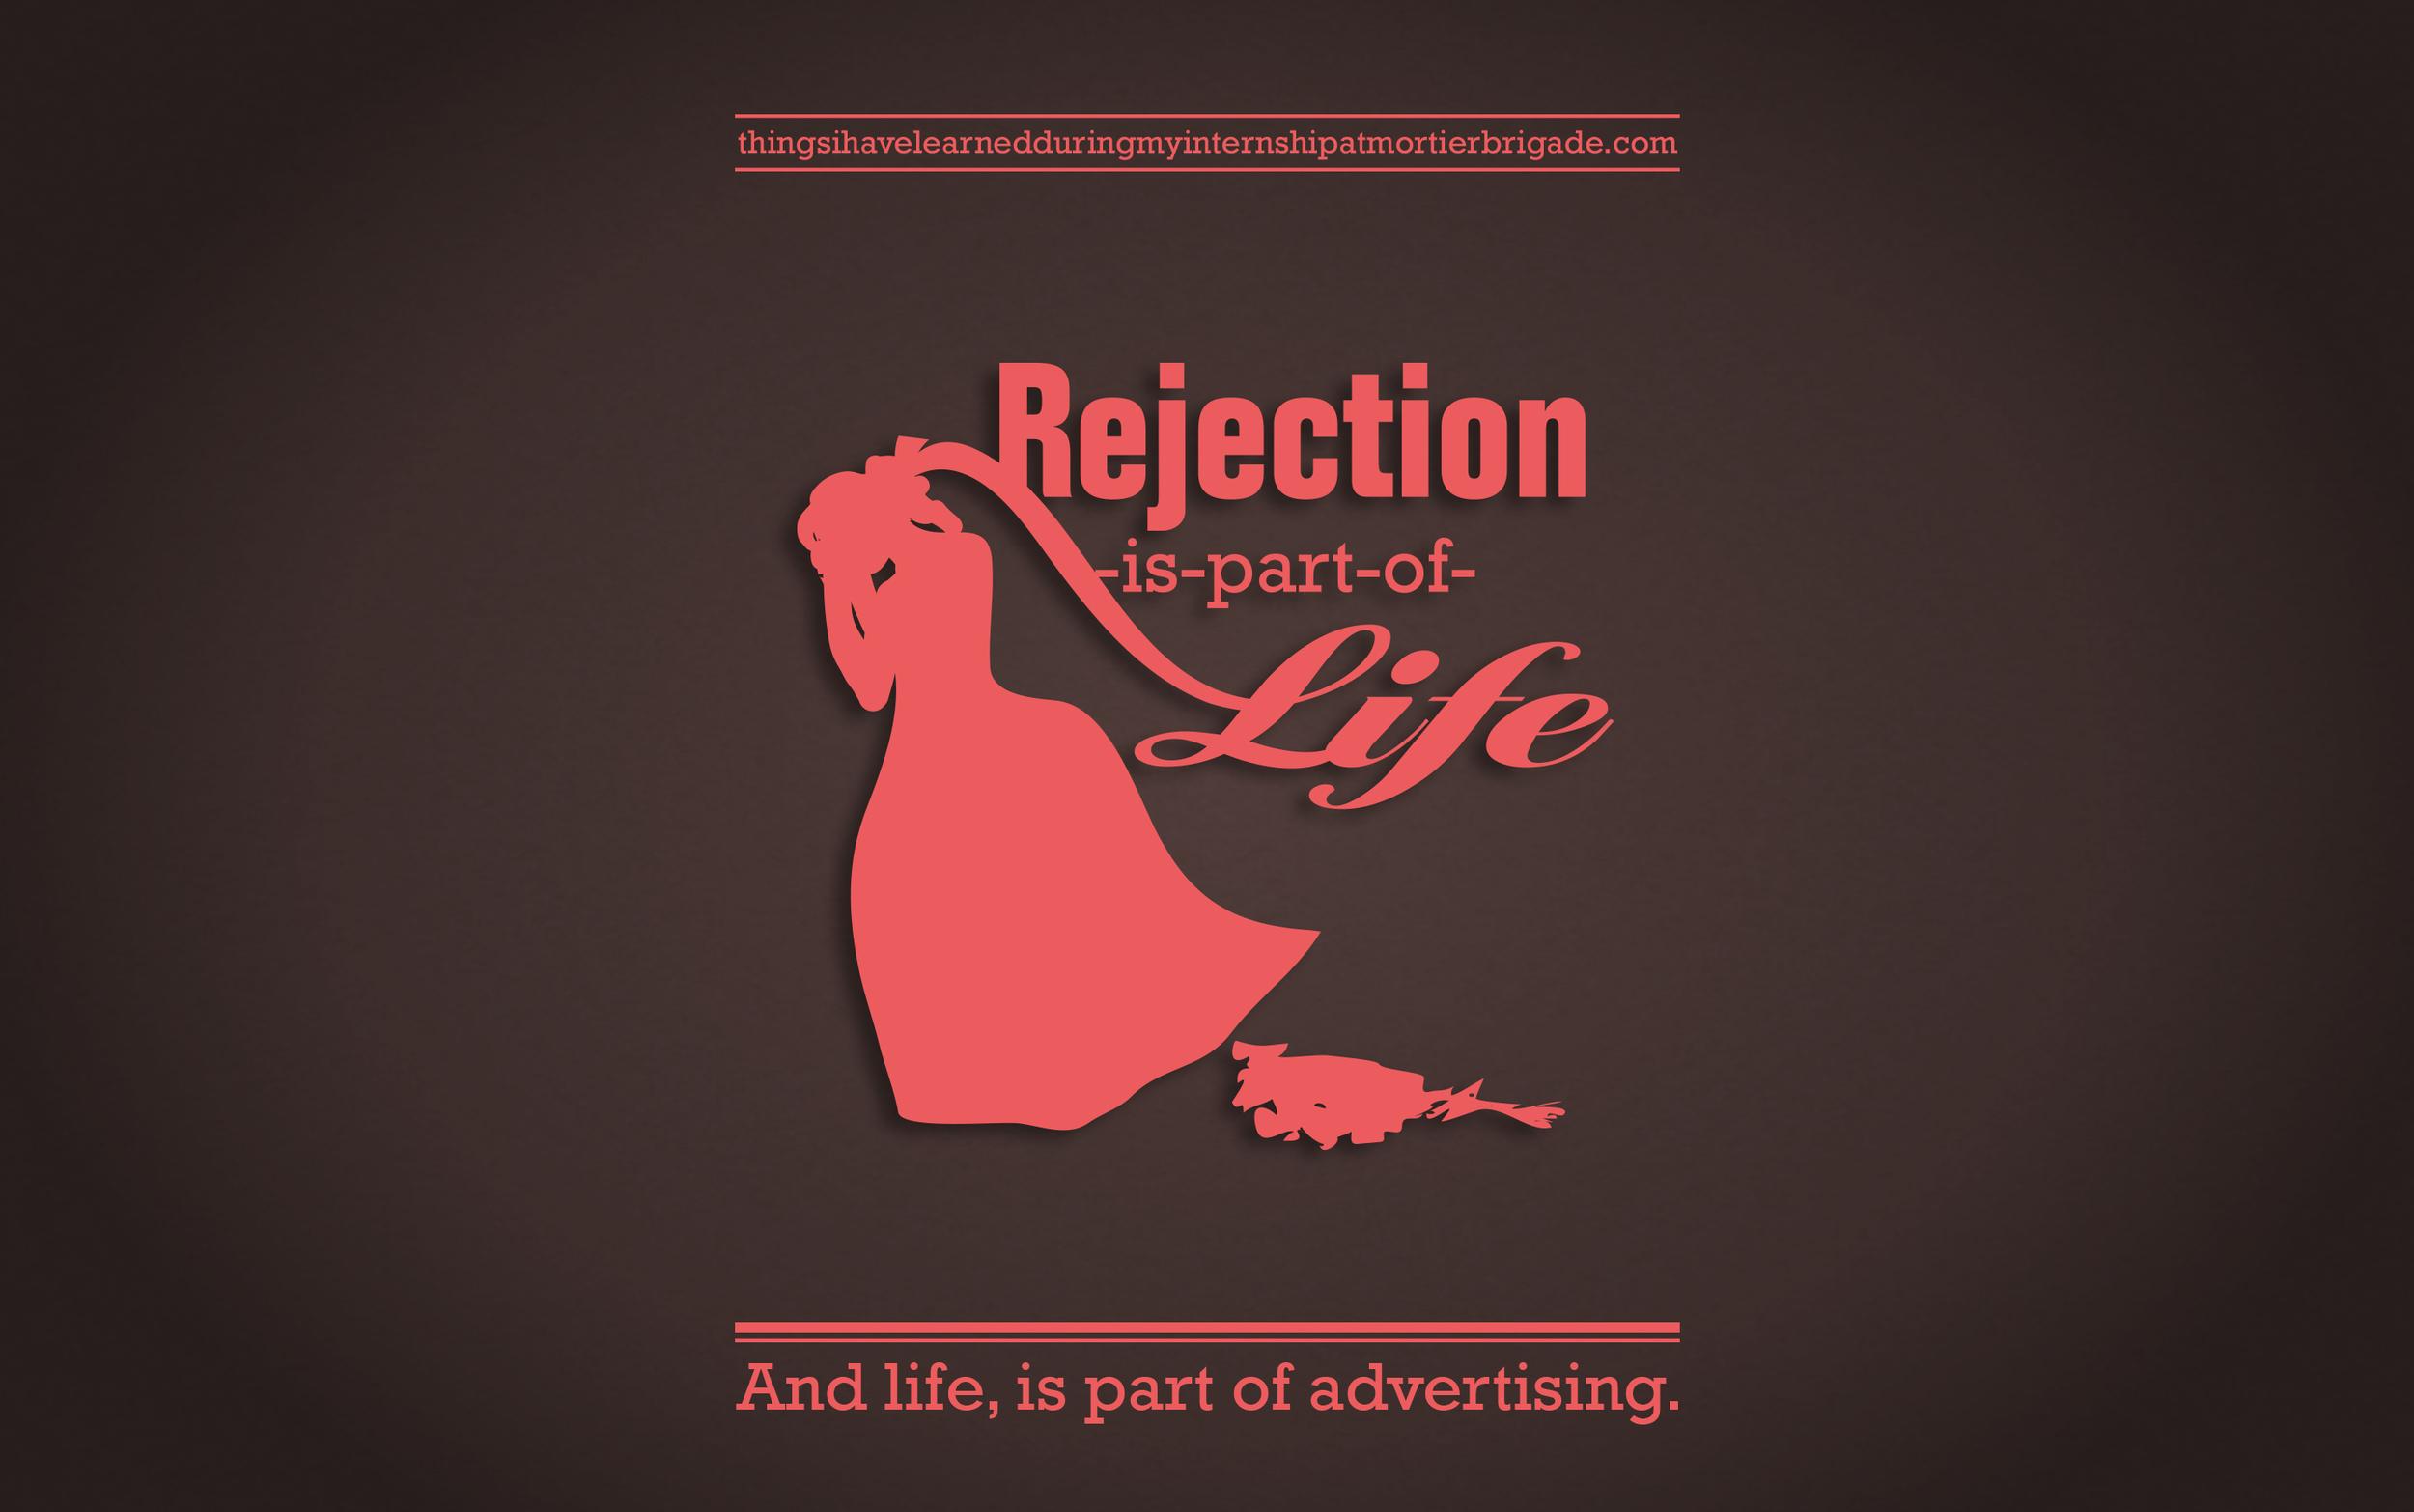 Brigadisms 15 rejection life.jpg